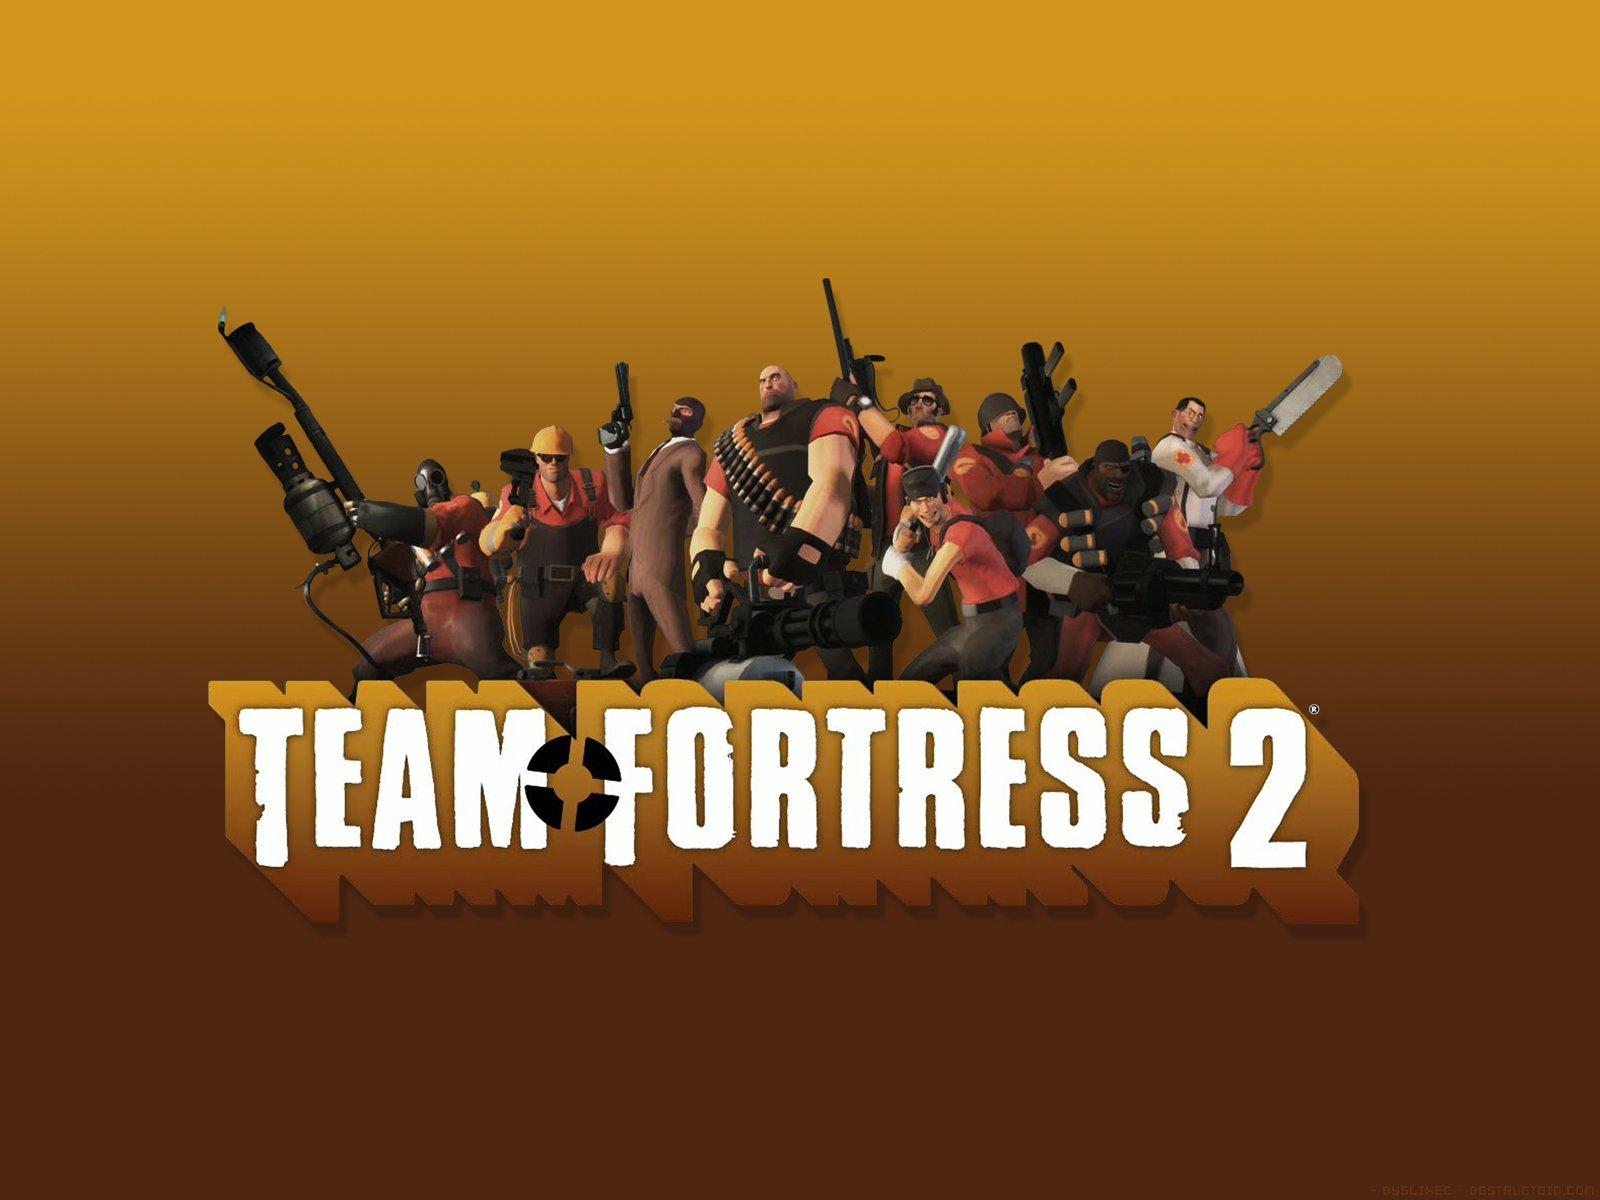 team fortress 2 classic wallpaper